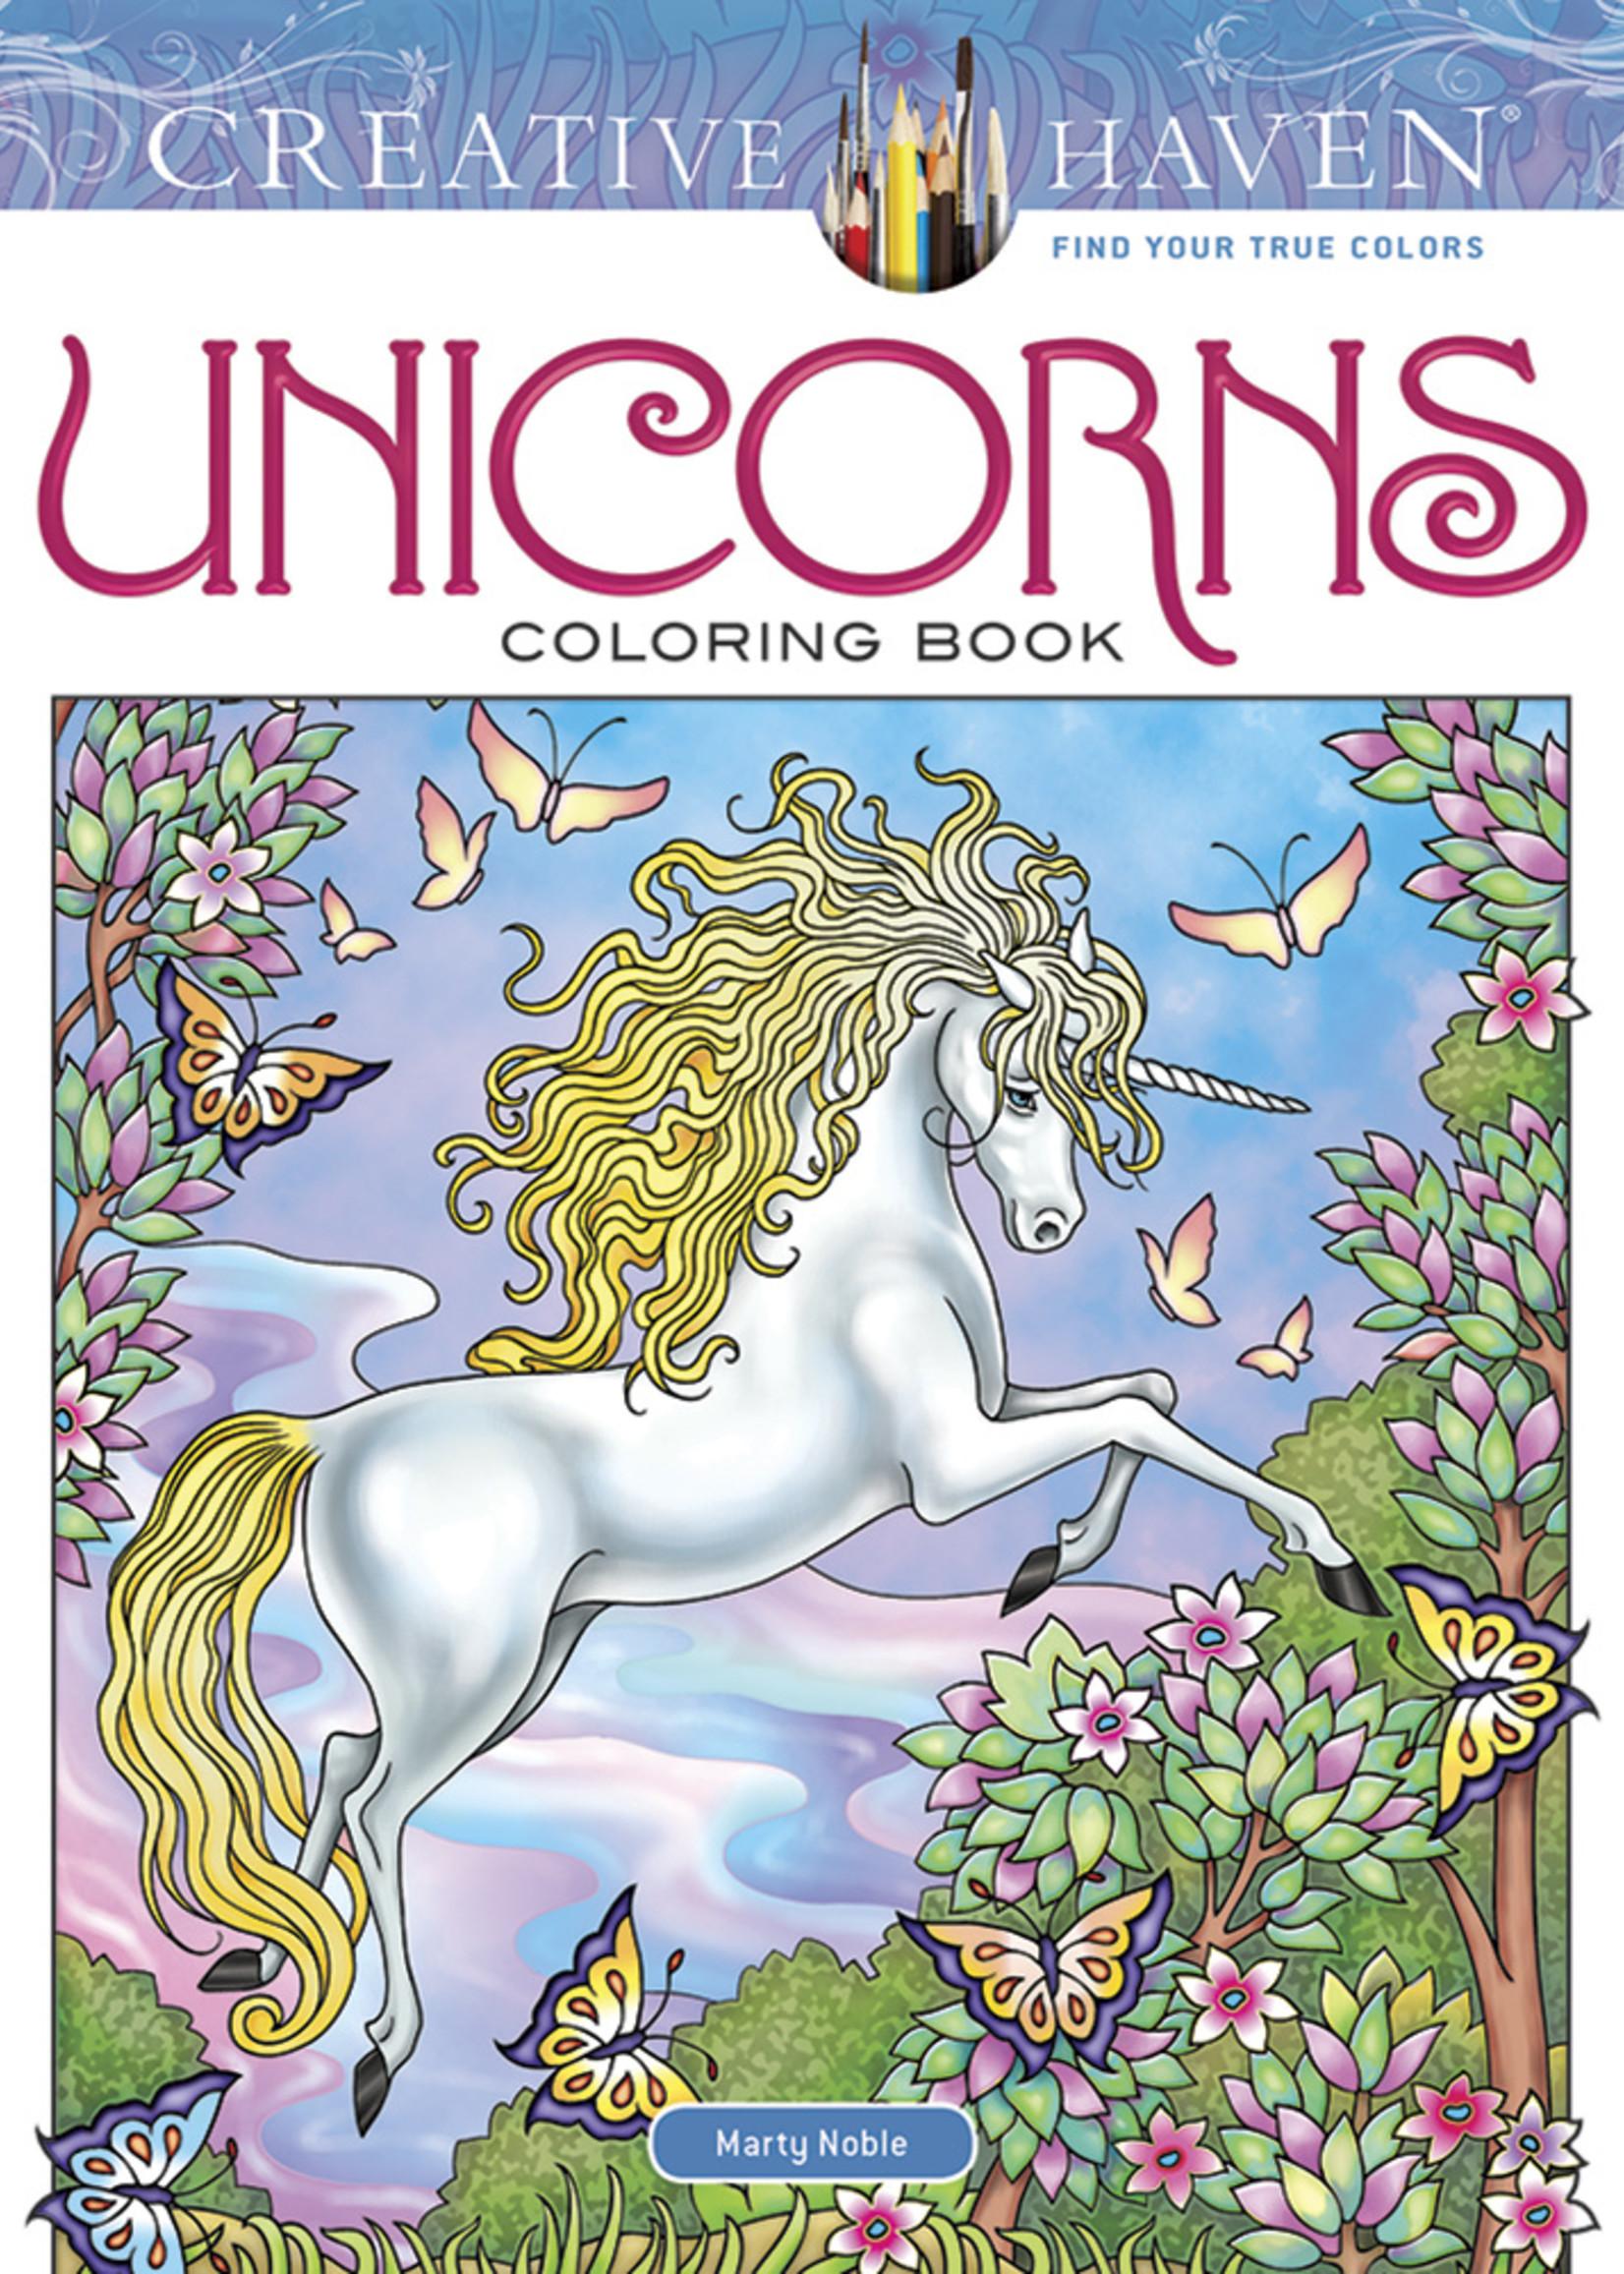 Creative Haven Unicorns Coloring Book - Paperback